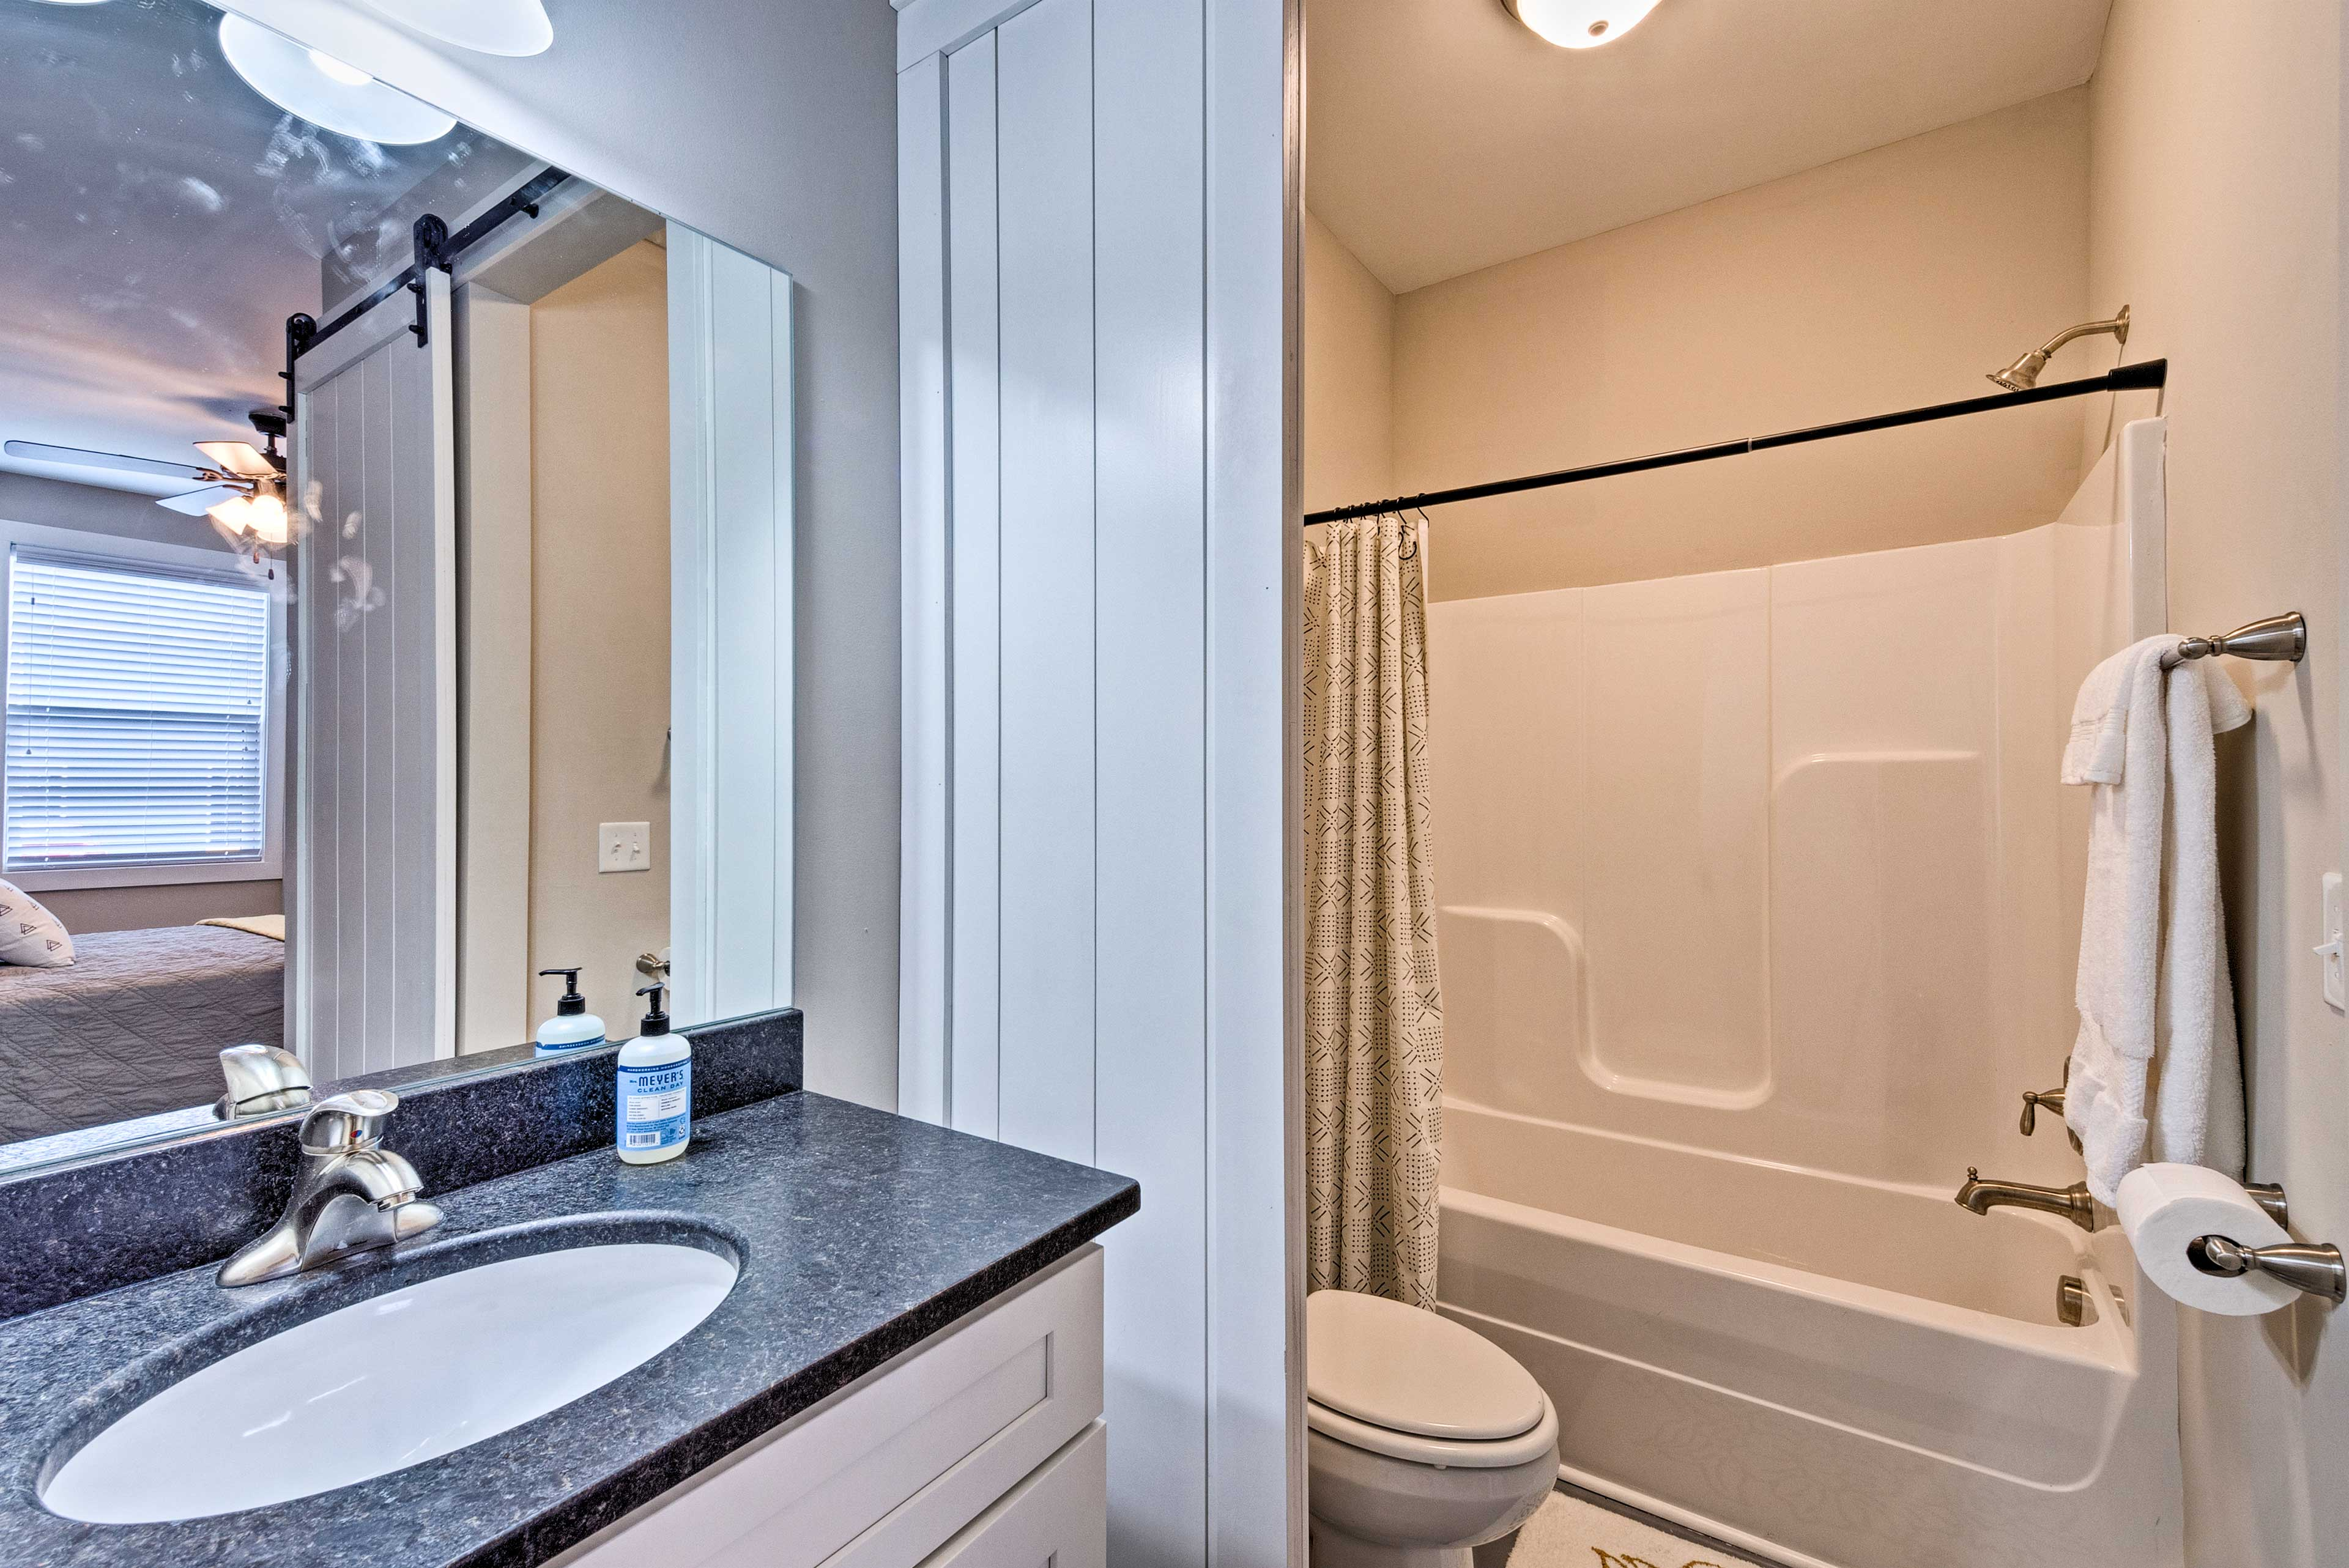 Get ready in the en-suite bathroom each morning.